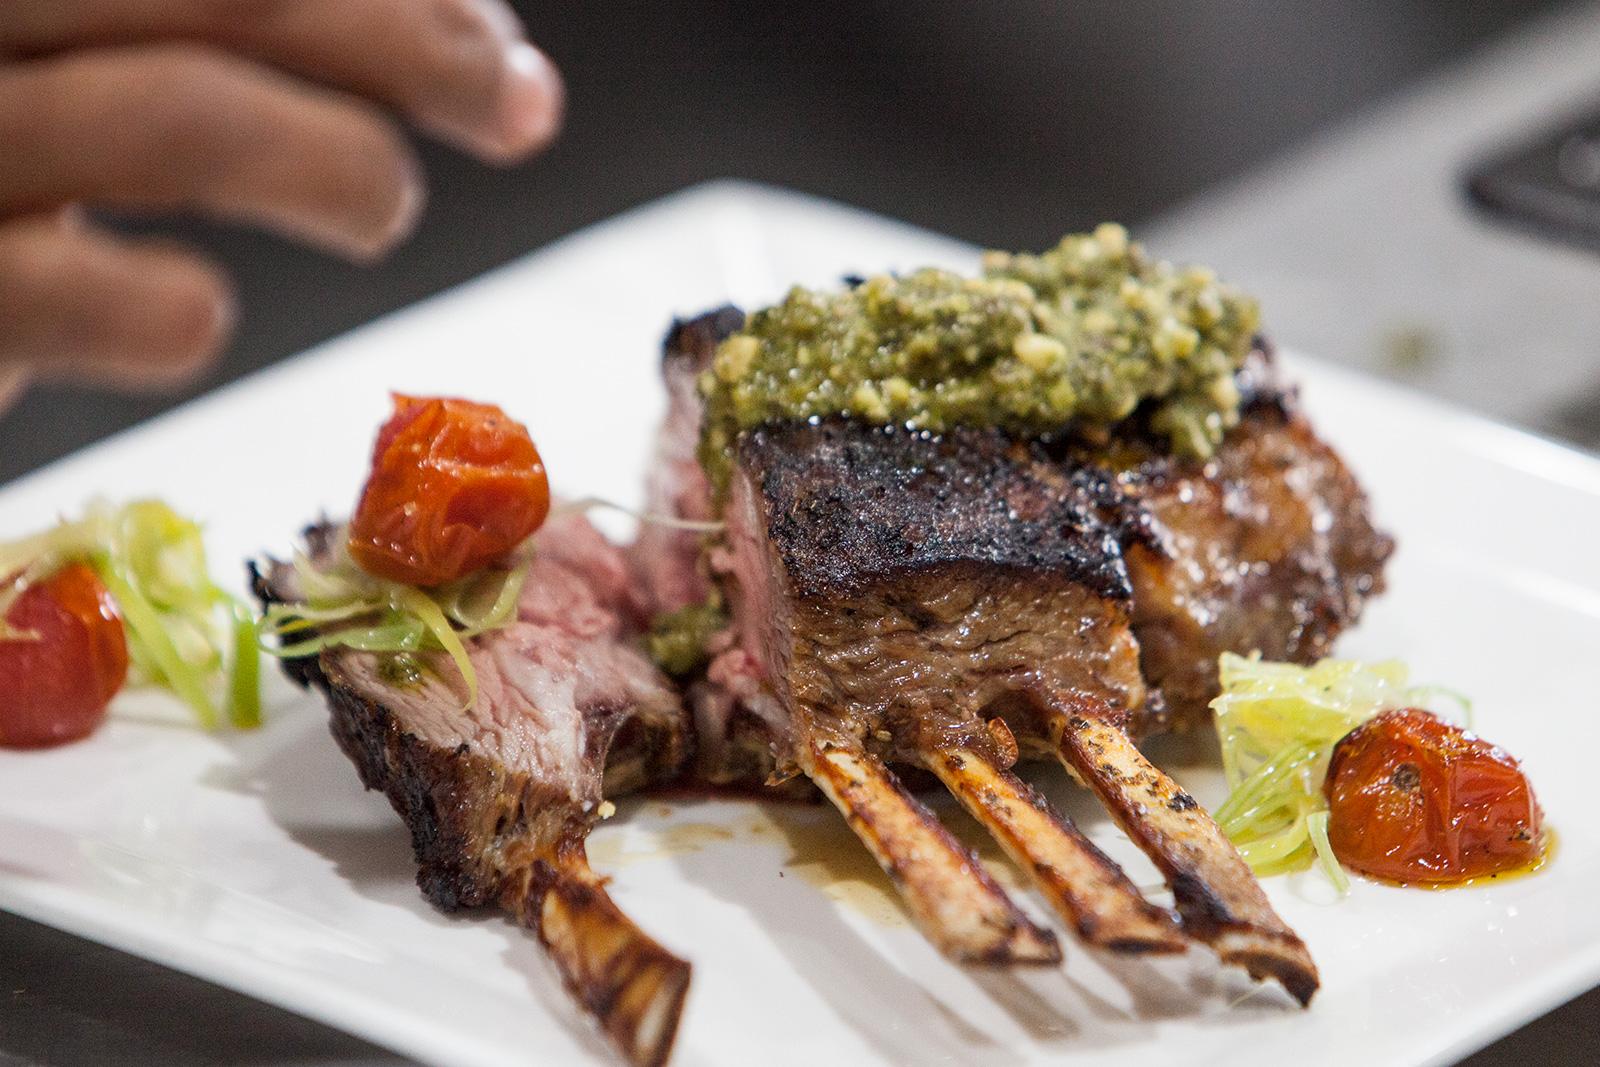 Lamb with pesto and veggies